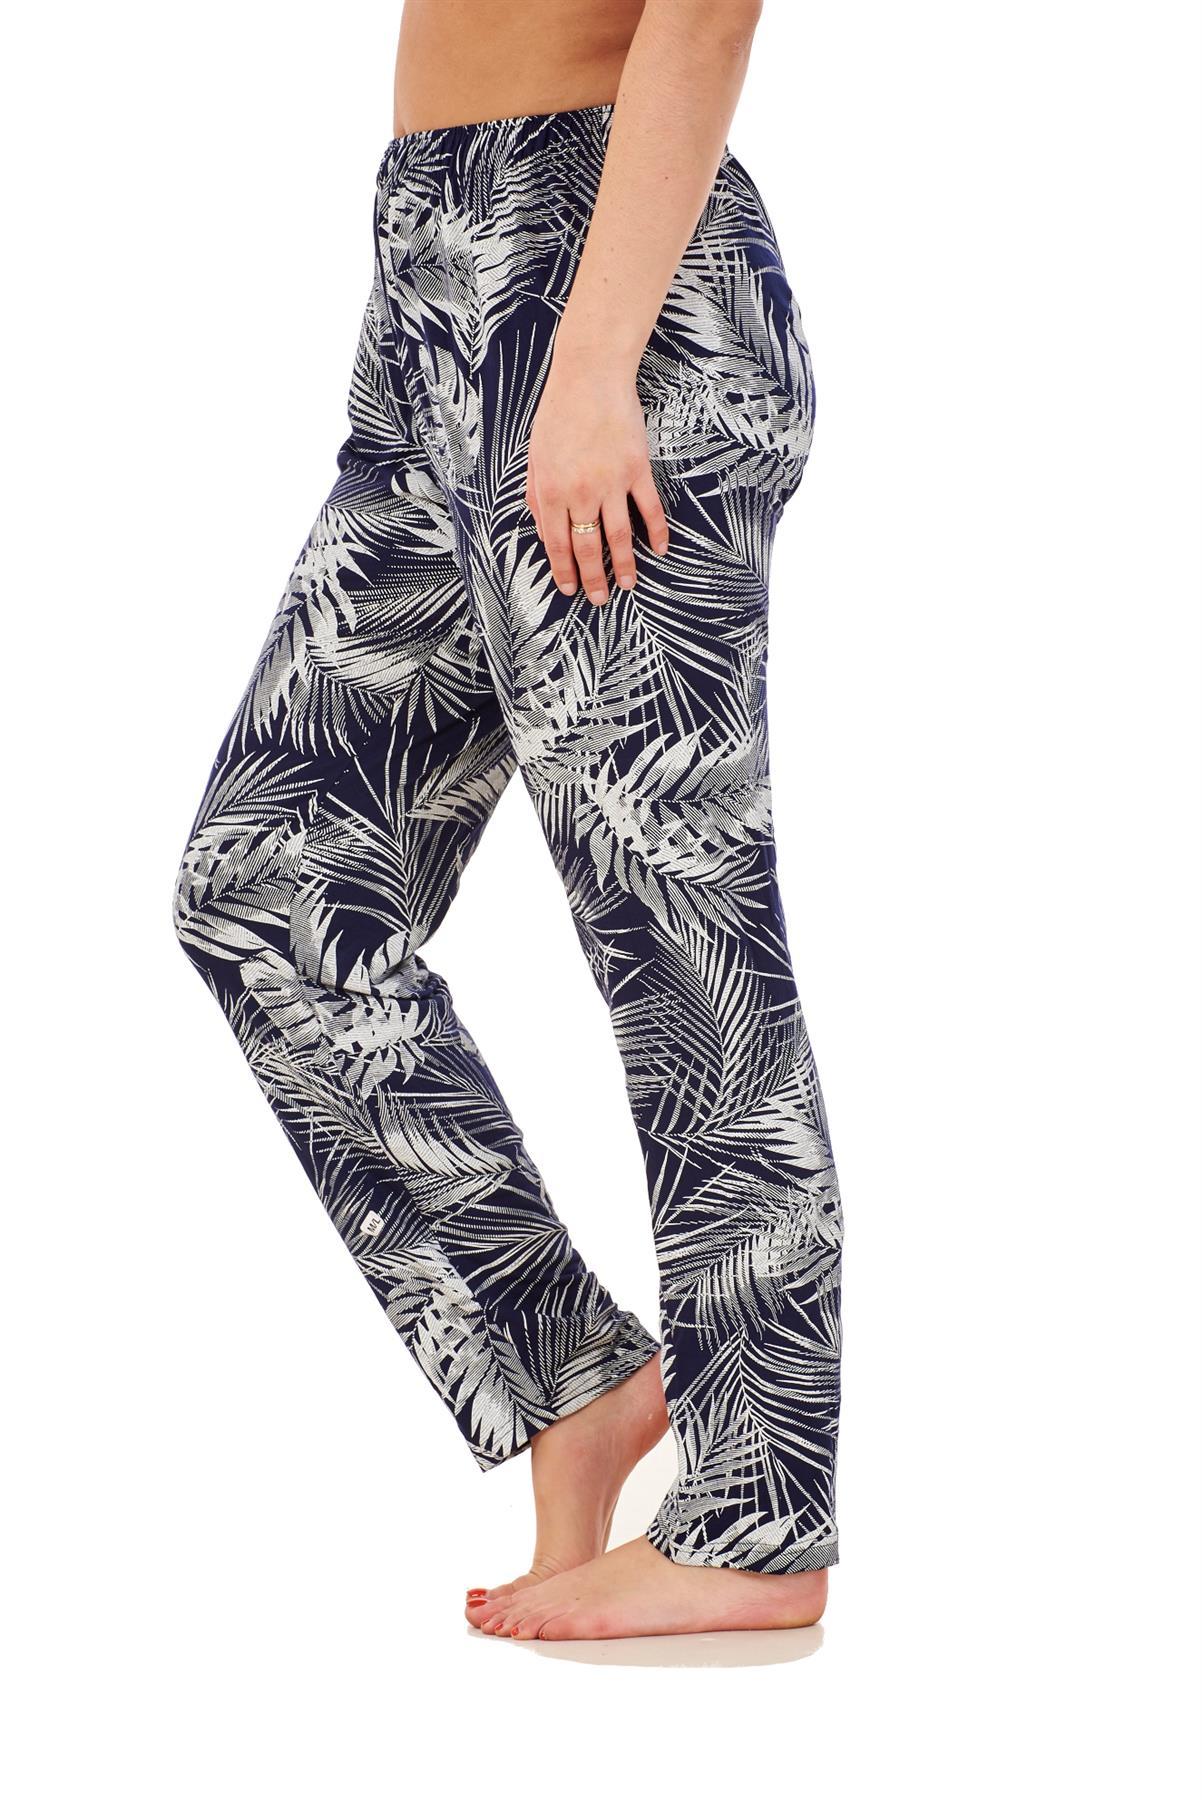 Ladies-Women-Trouser-Elasticated-Printed-Tapered-Harem-High-waist-Regular-Pants thumbnail 27